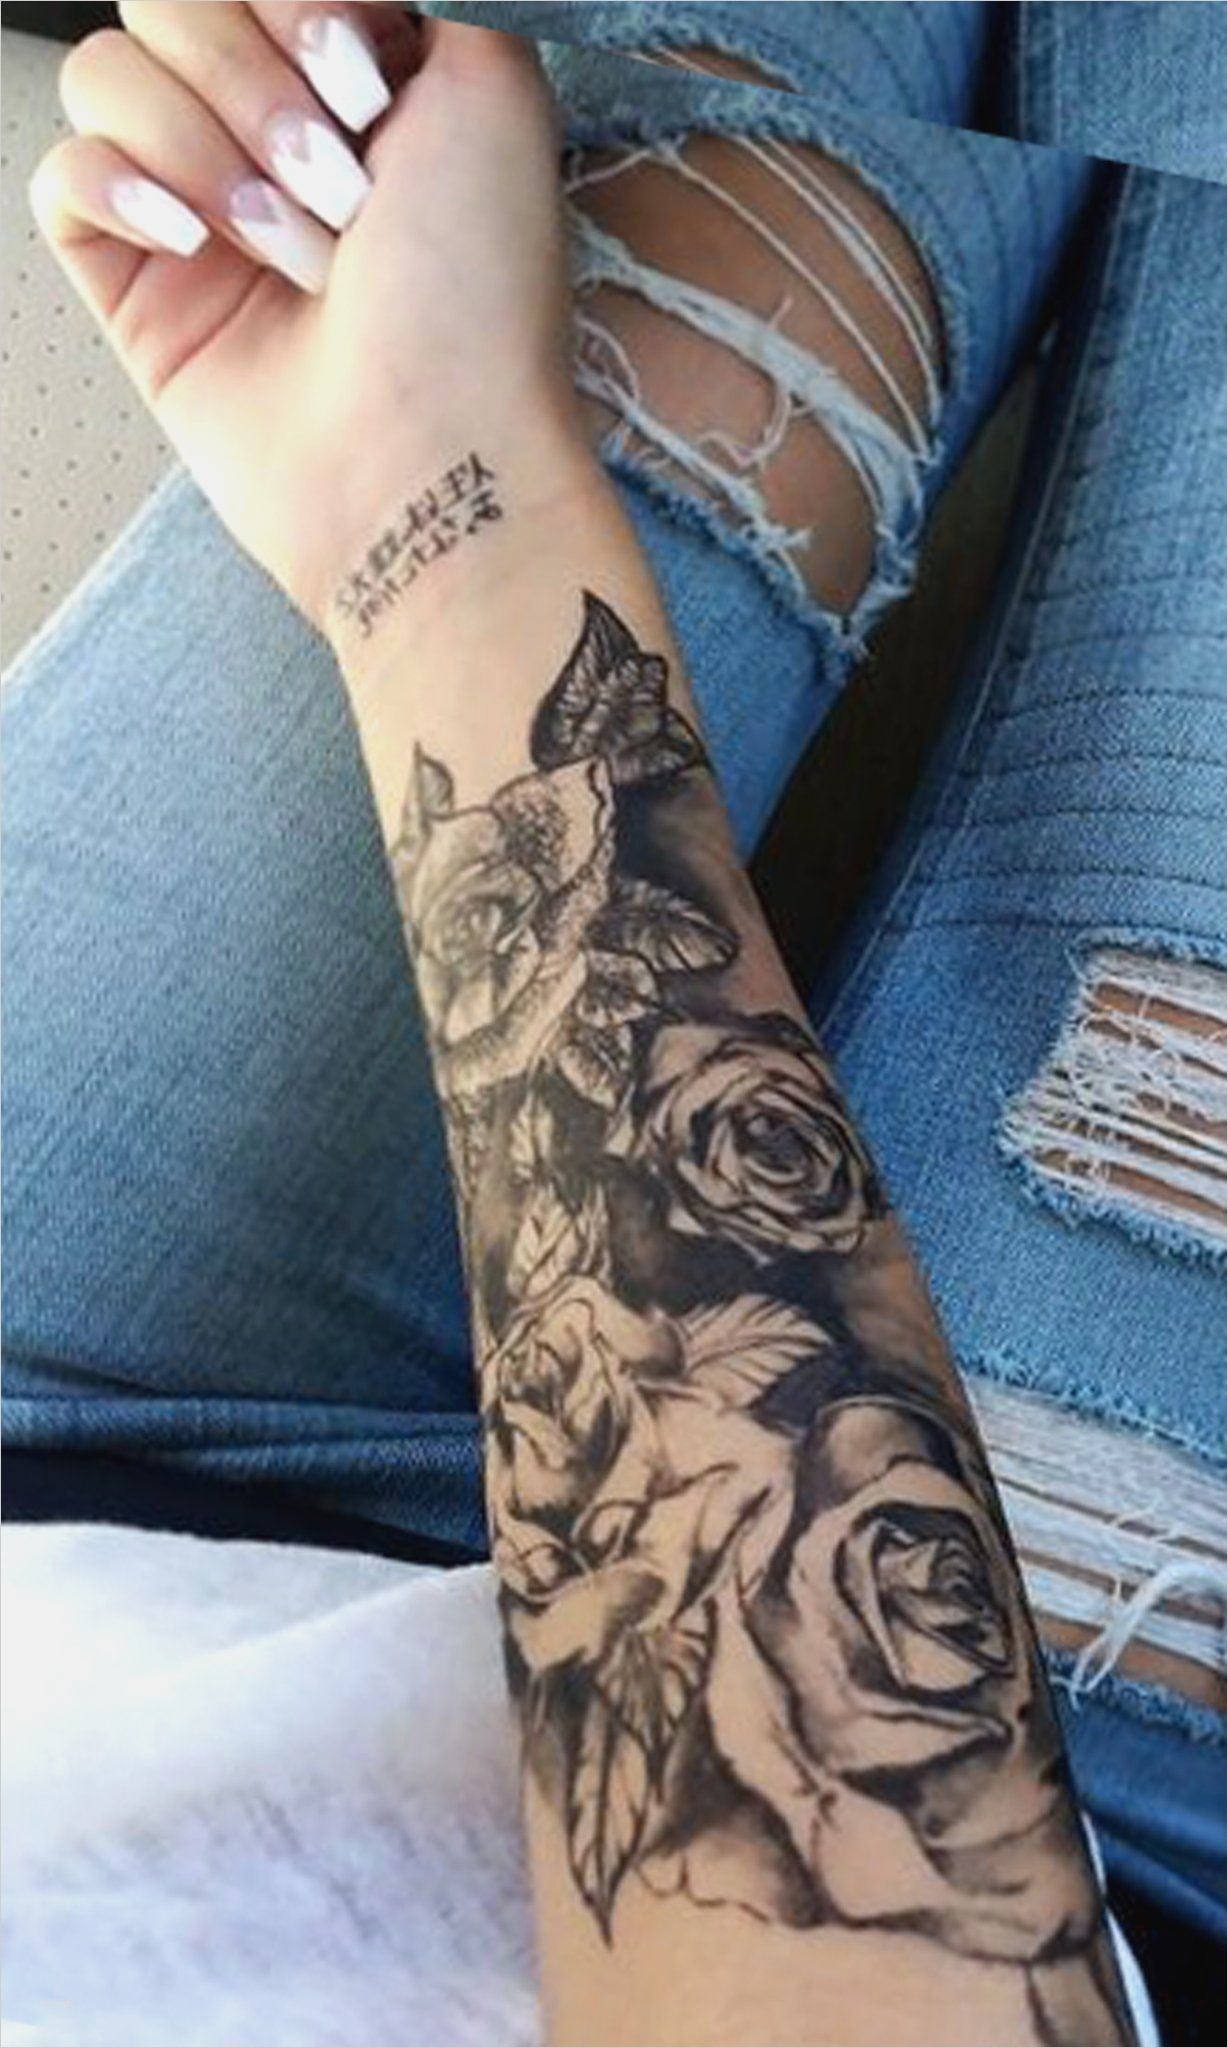 Full Arm Tattoo Vorlagen Wunderbar Black Rose Forearm Tattoo Ideas regarding dimensions 1228 X 2048